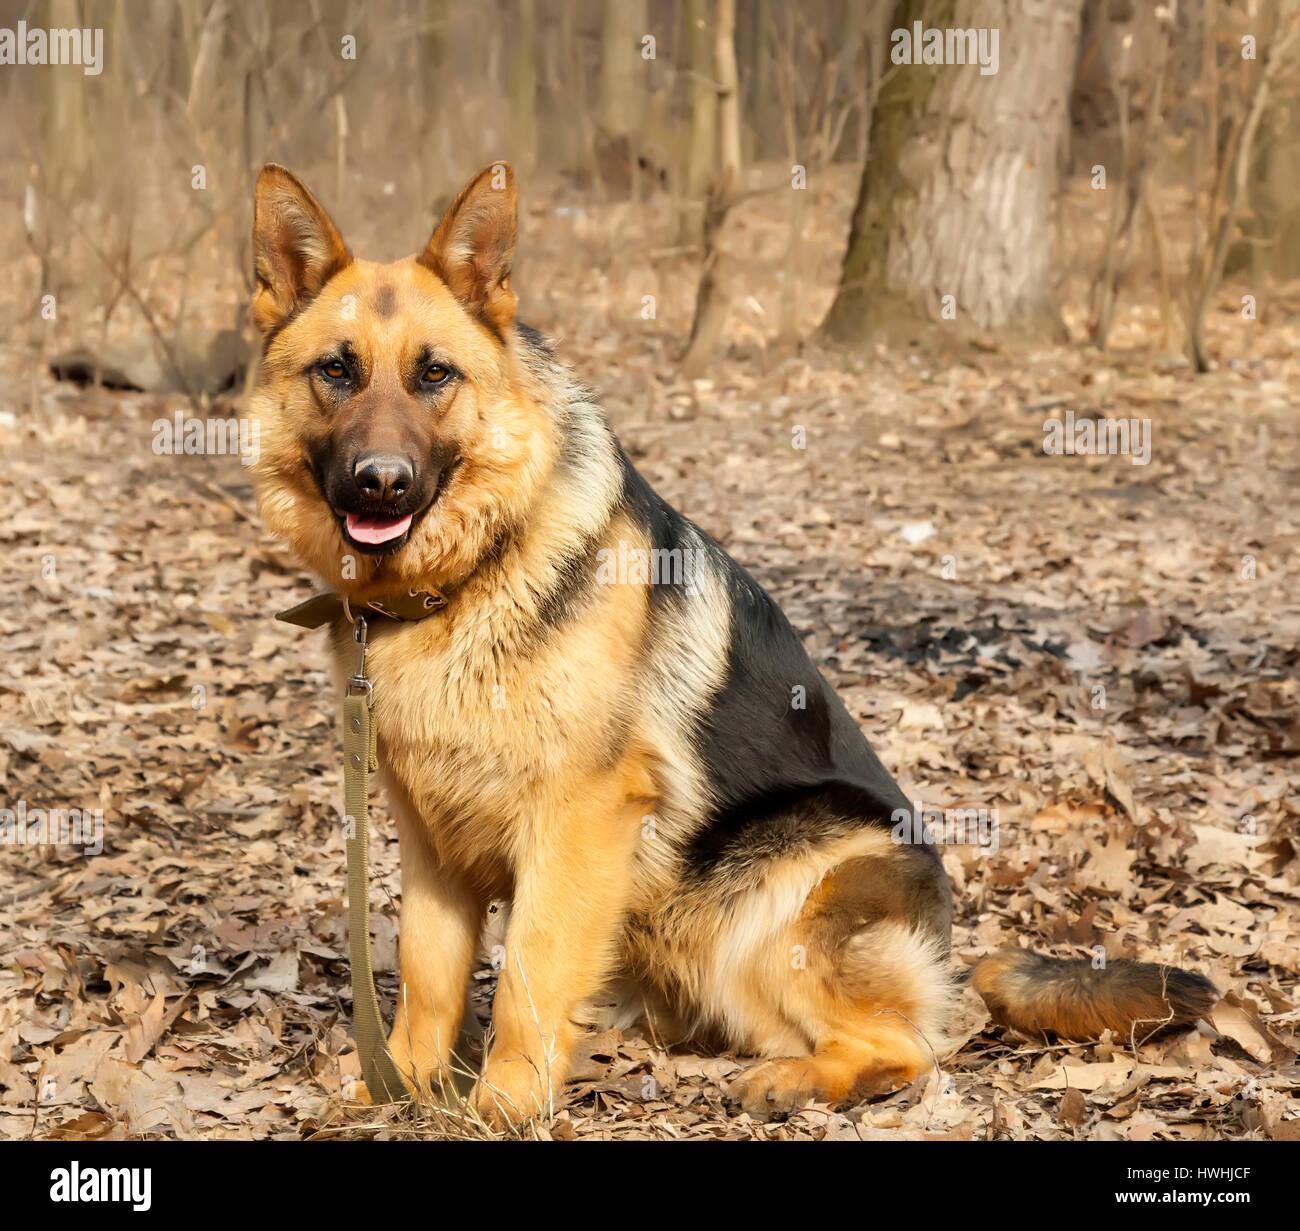 German shepherd dog sitting training - Stock Image